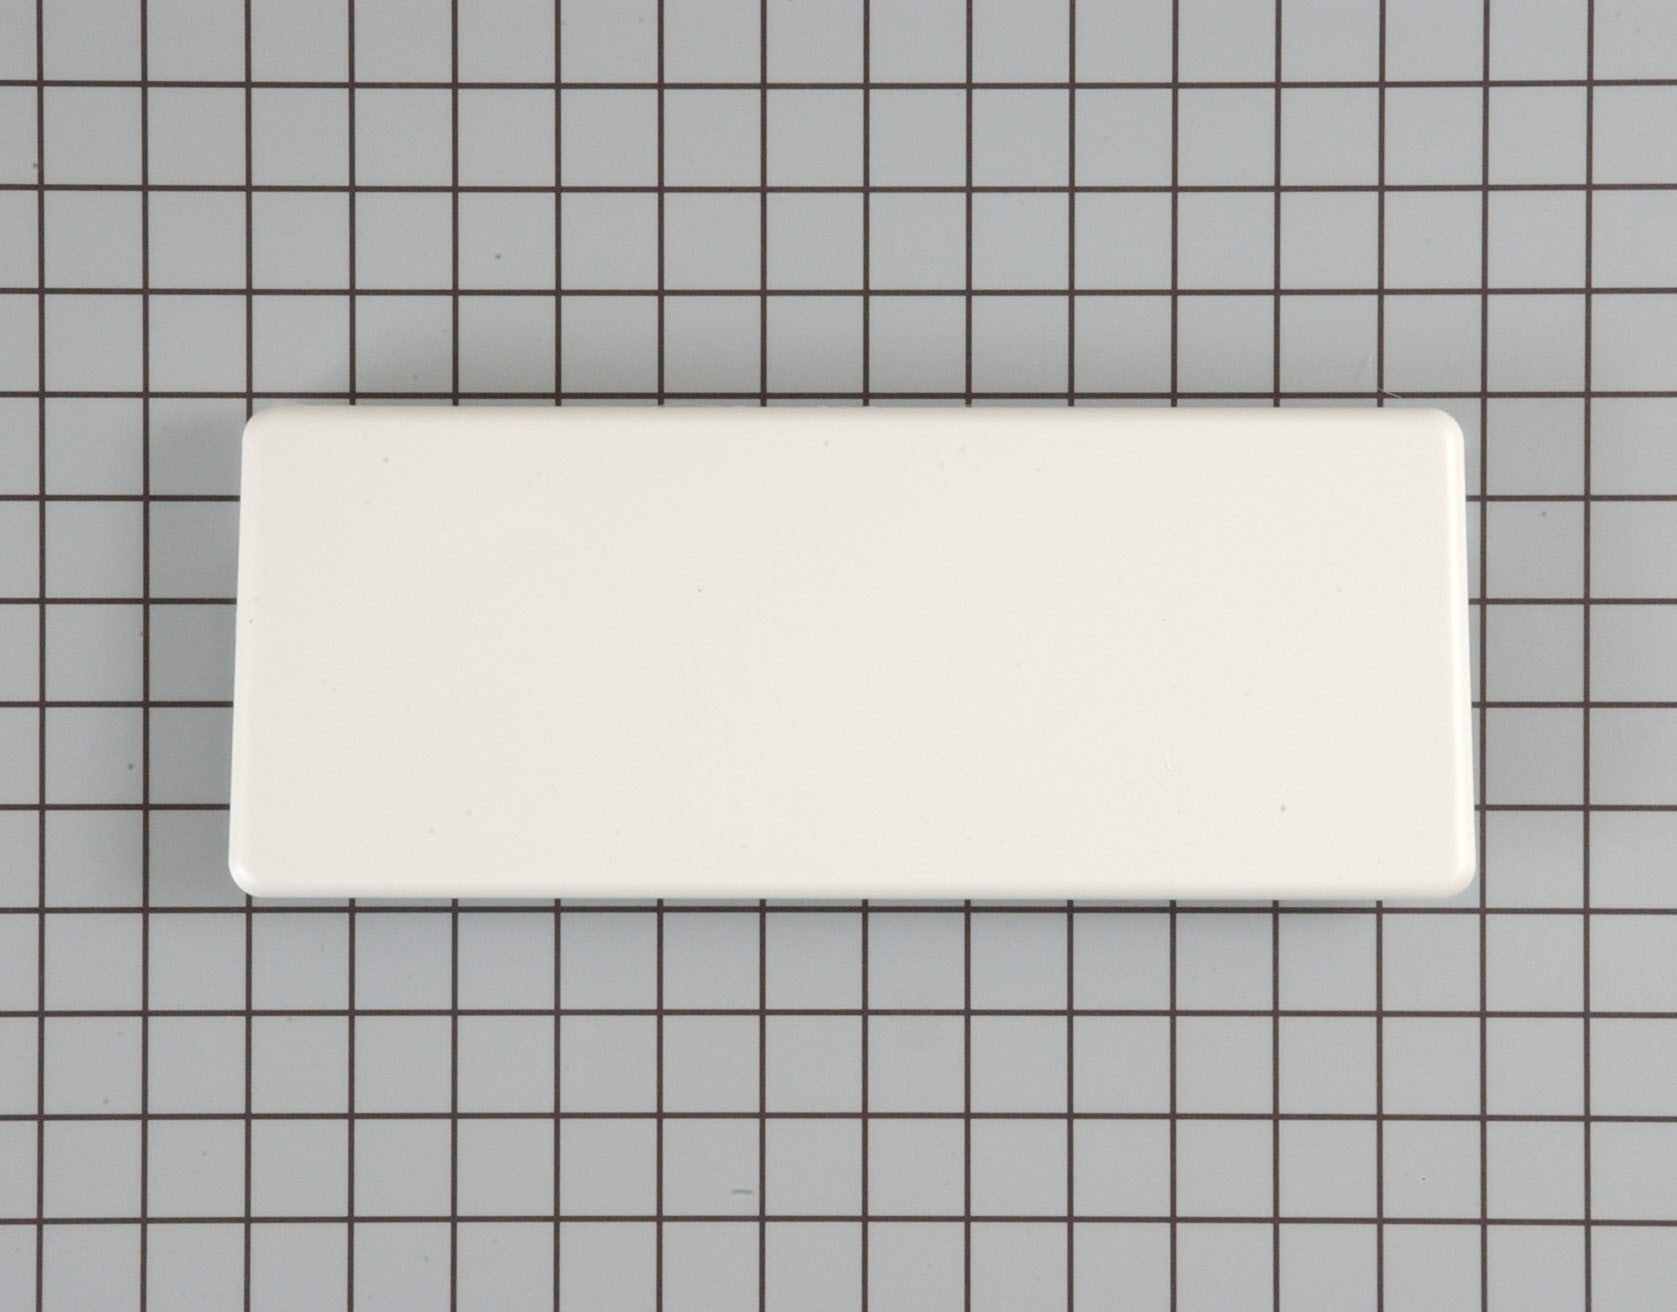 Crosley Refrigerator Part # WP2188236 - Dairy Door